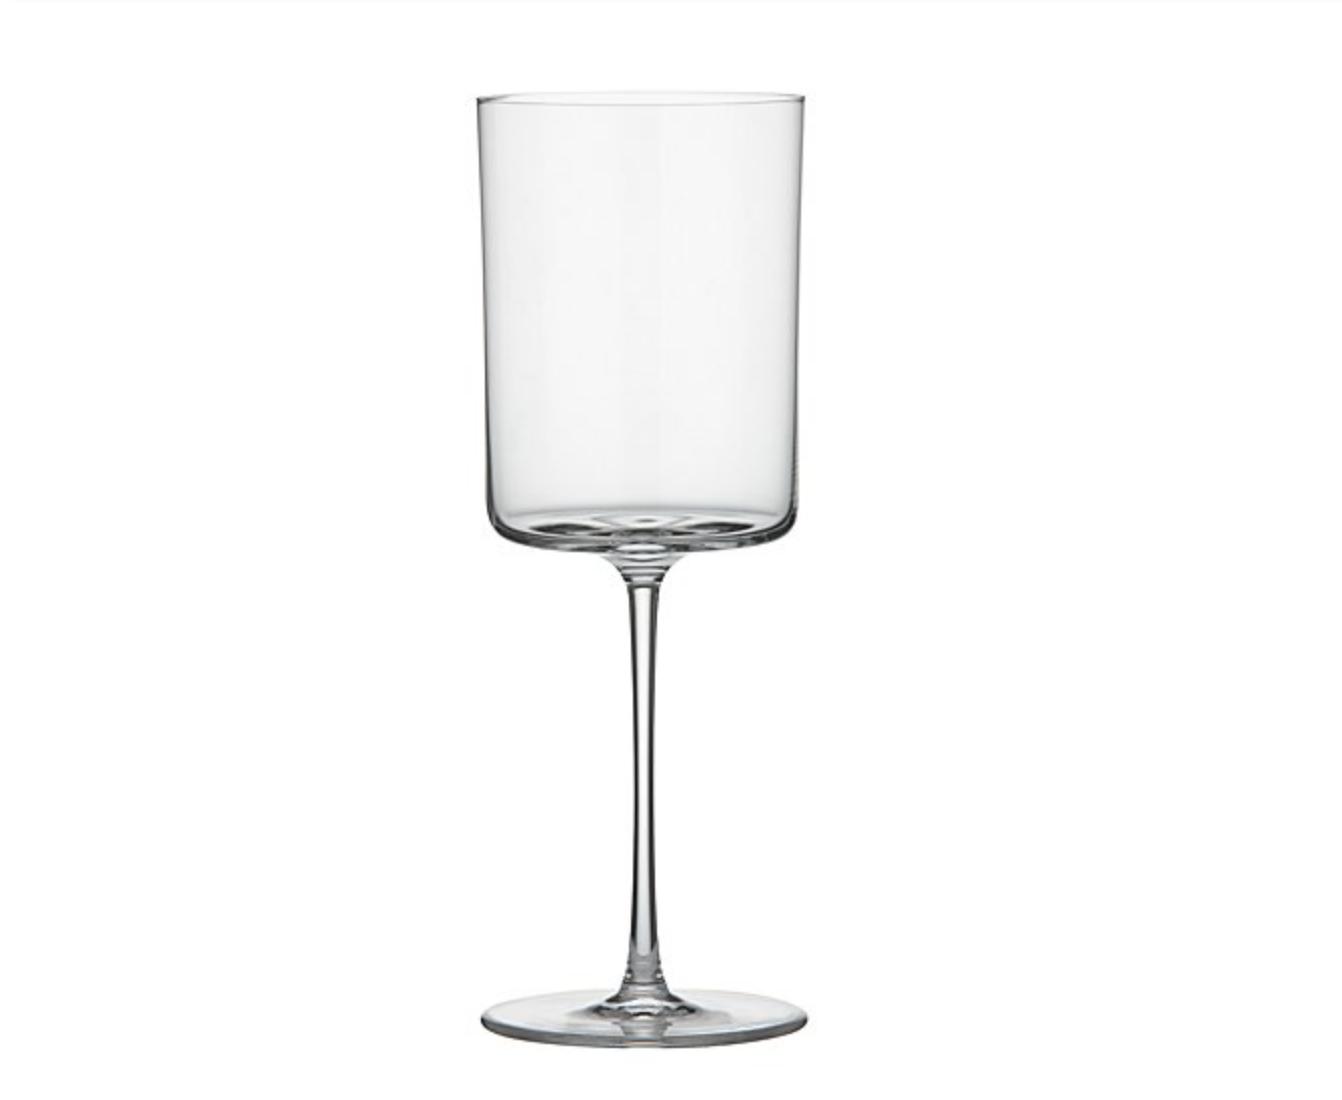 Stemless Wine Glass in Misty White